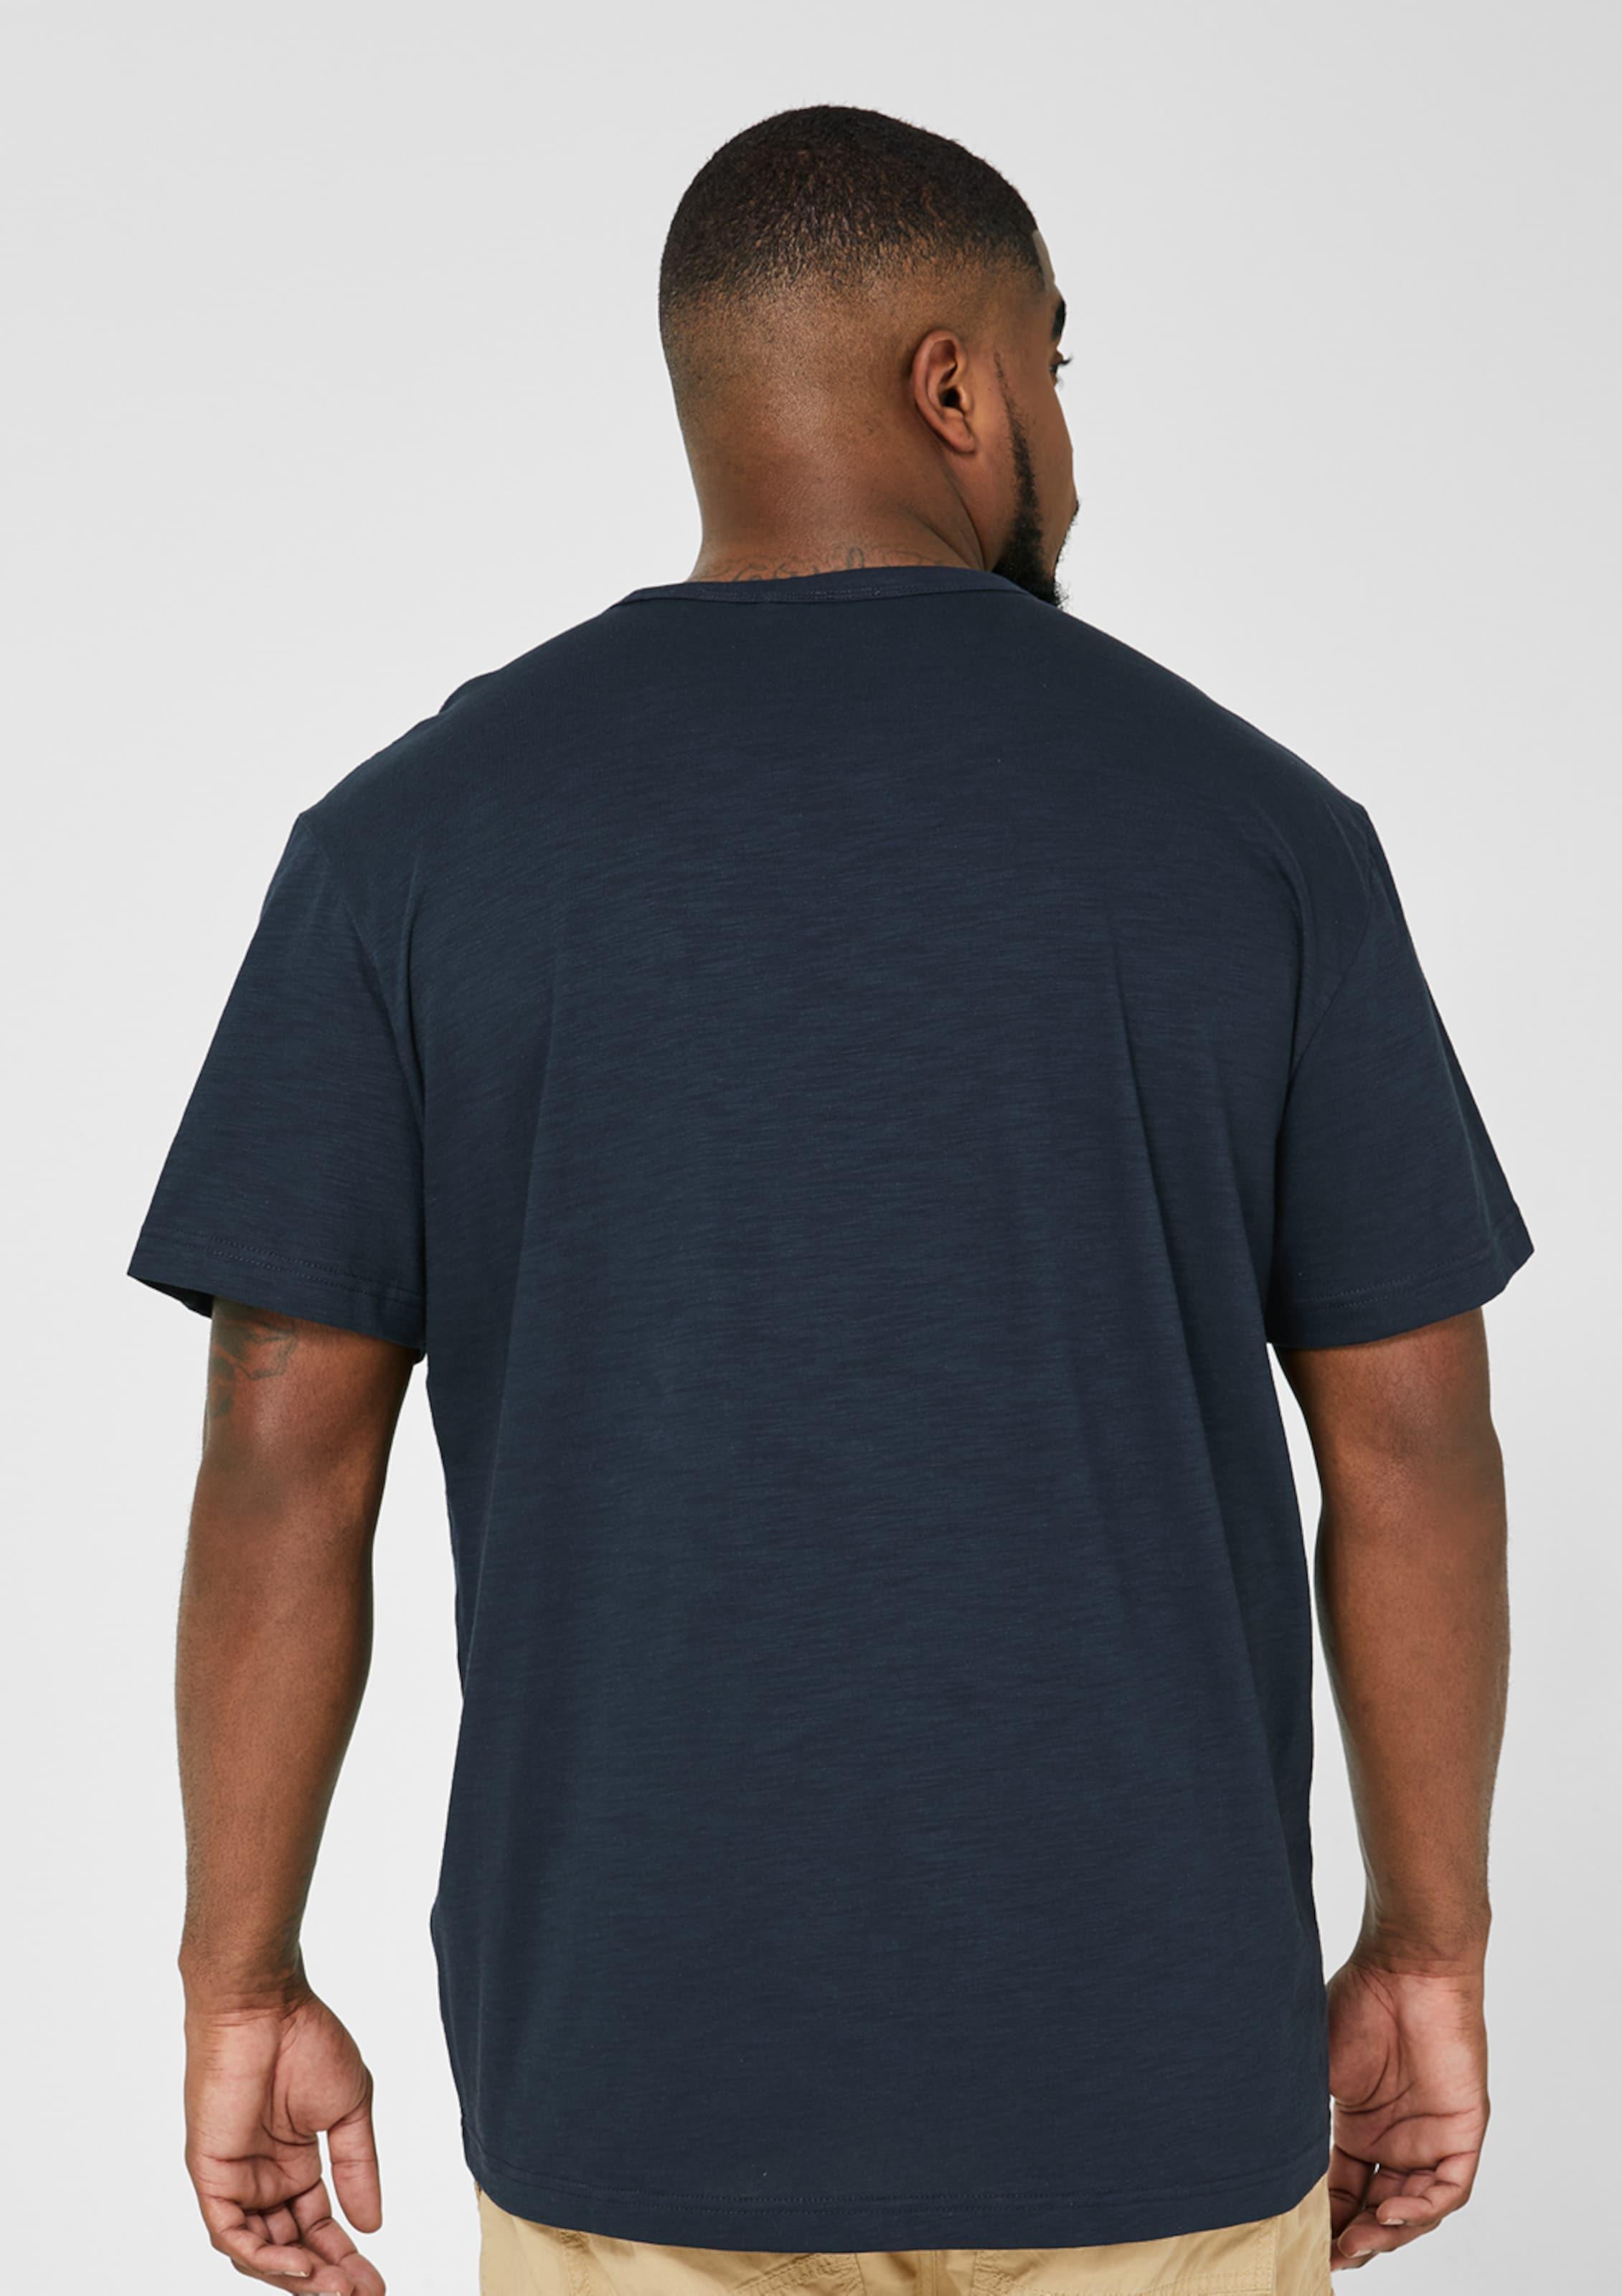 S oliver Gelb shirt T Pitaya Grün NachtblauRoyalblau In OTXuPZik